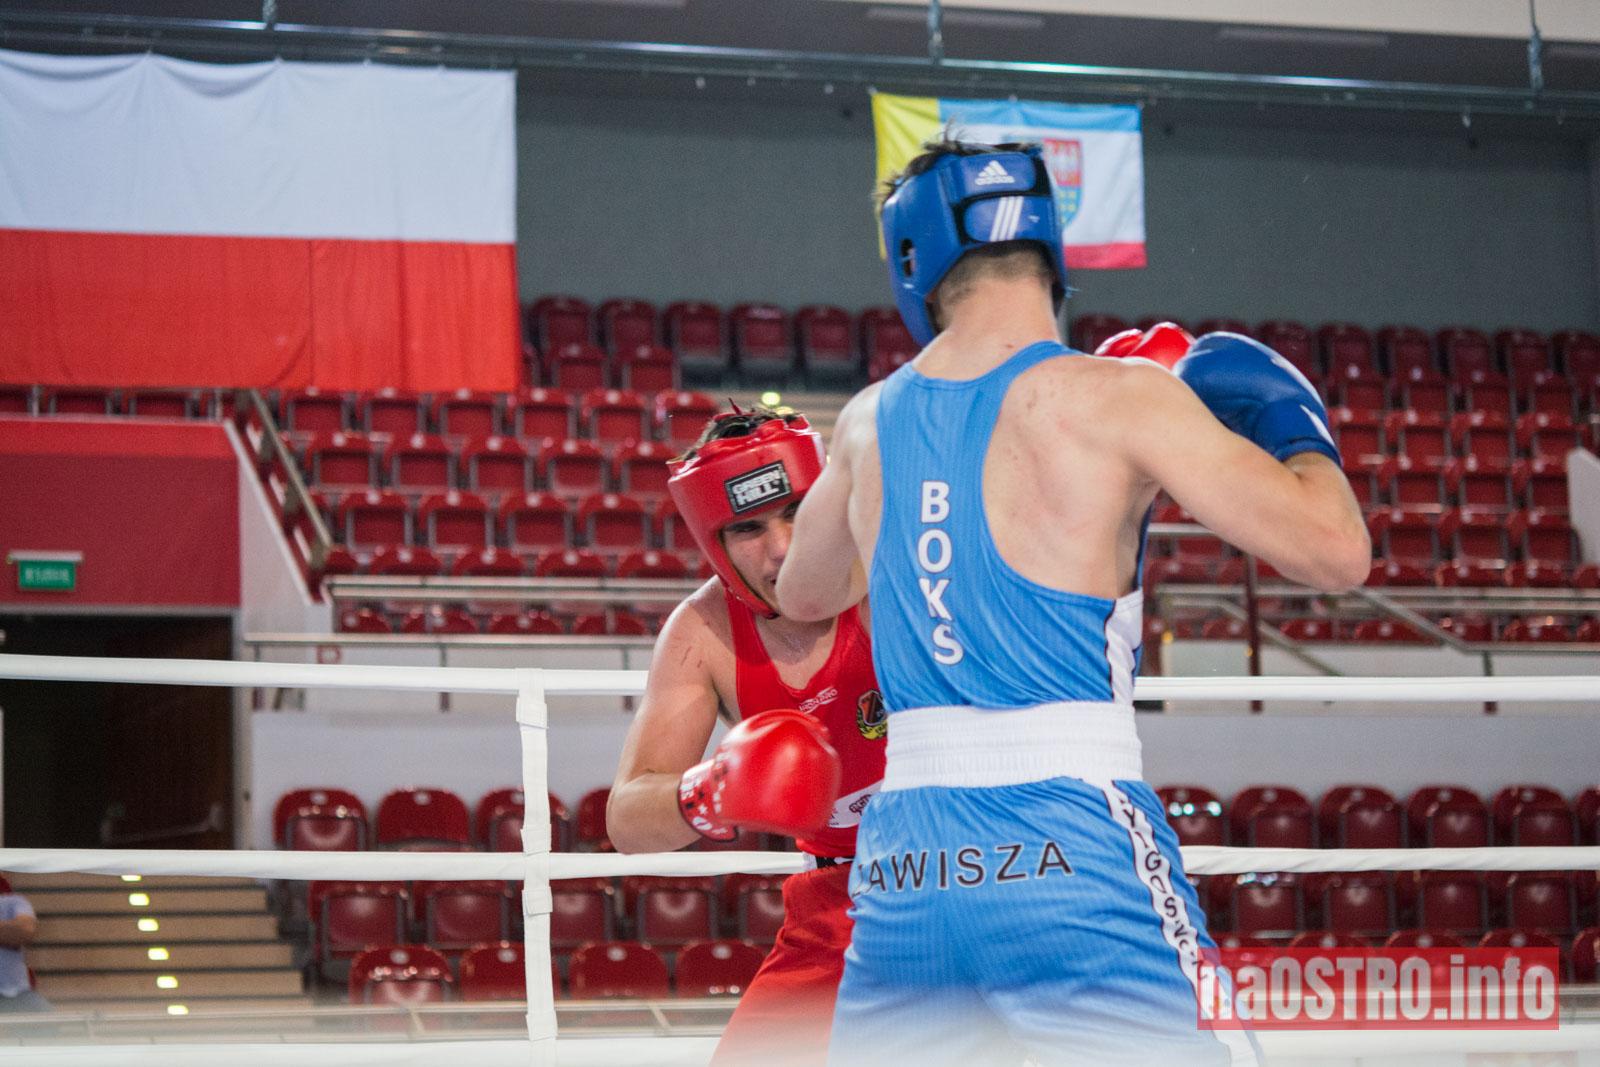 NaOSTRO BOKS Olimpiada-83